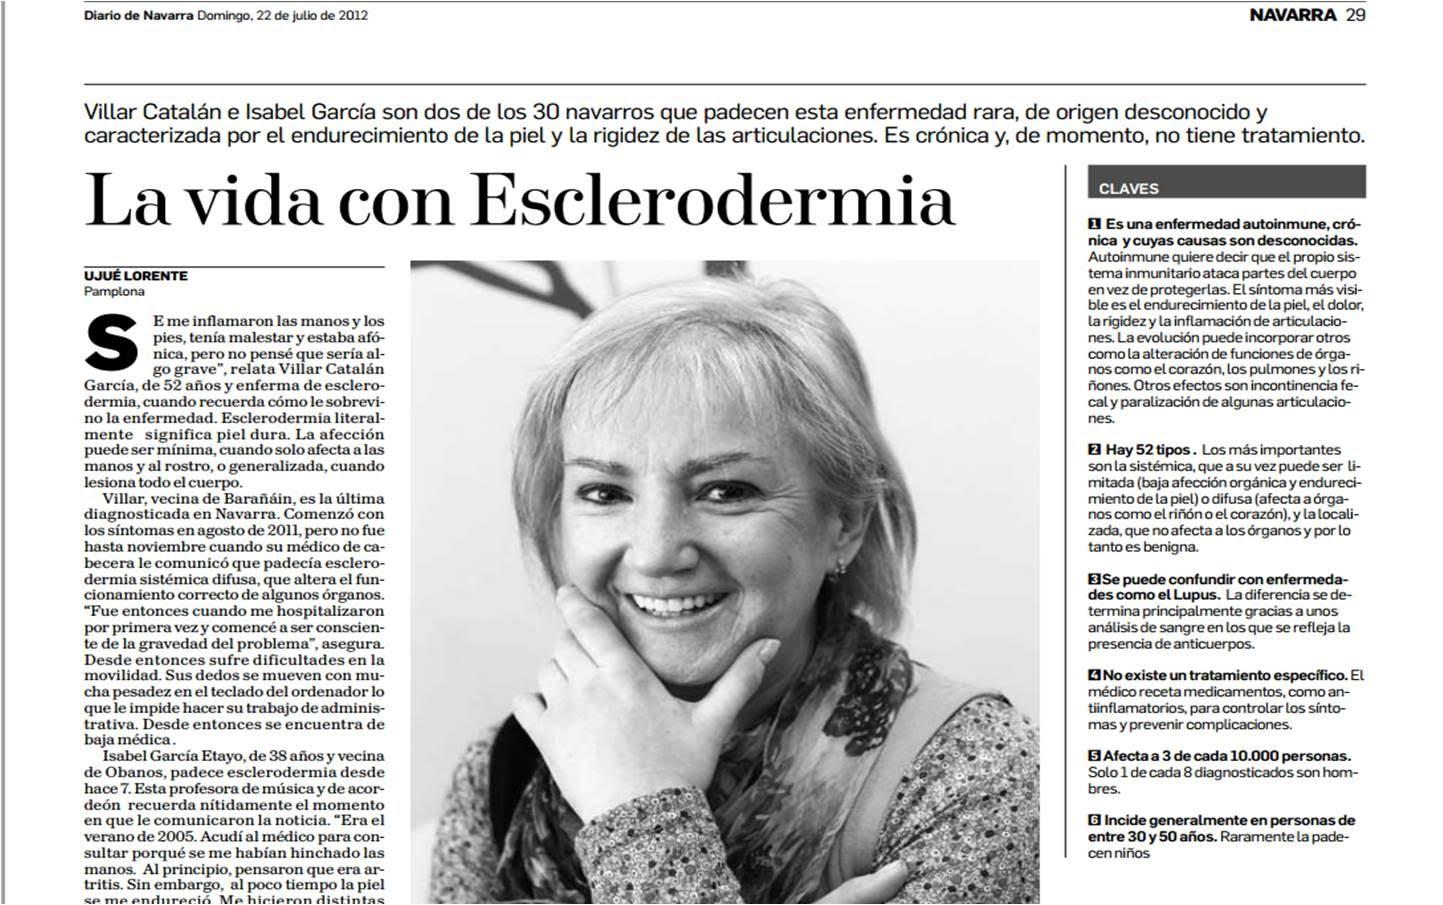 http://www.esclerodermia.org/scleroderma/wp-content/uploads/2012/07/22.07.12-La-vida-con-Esclerodermia.-Villar-Catal%C3%A1n.pdf